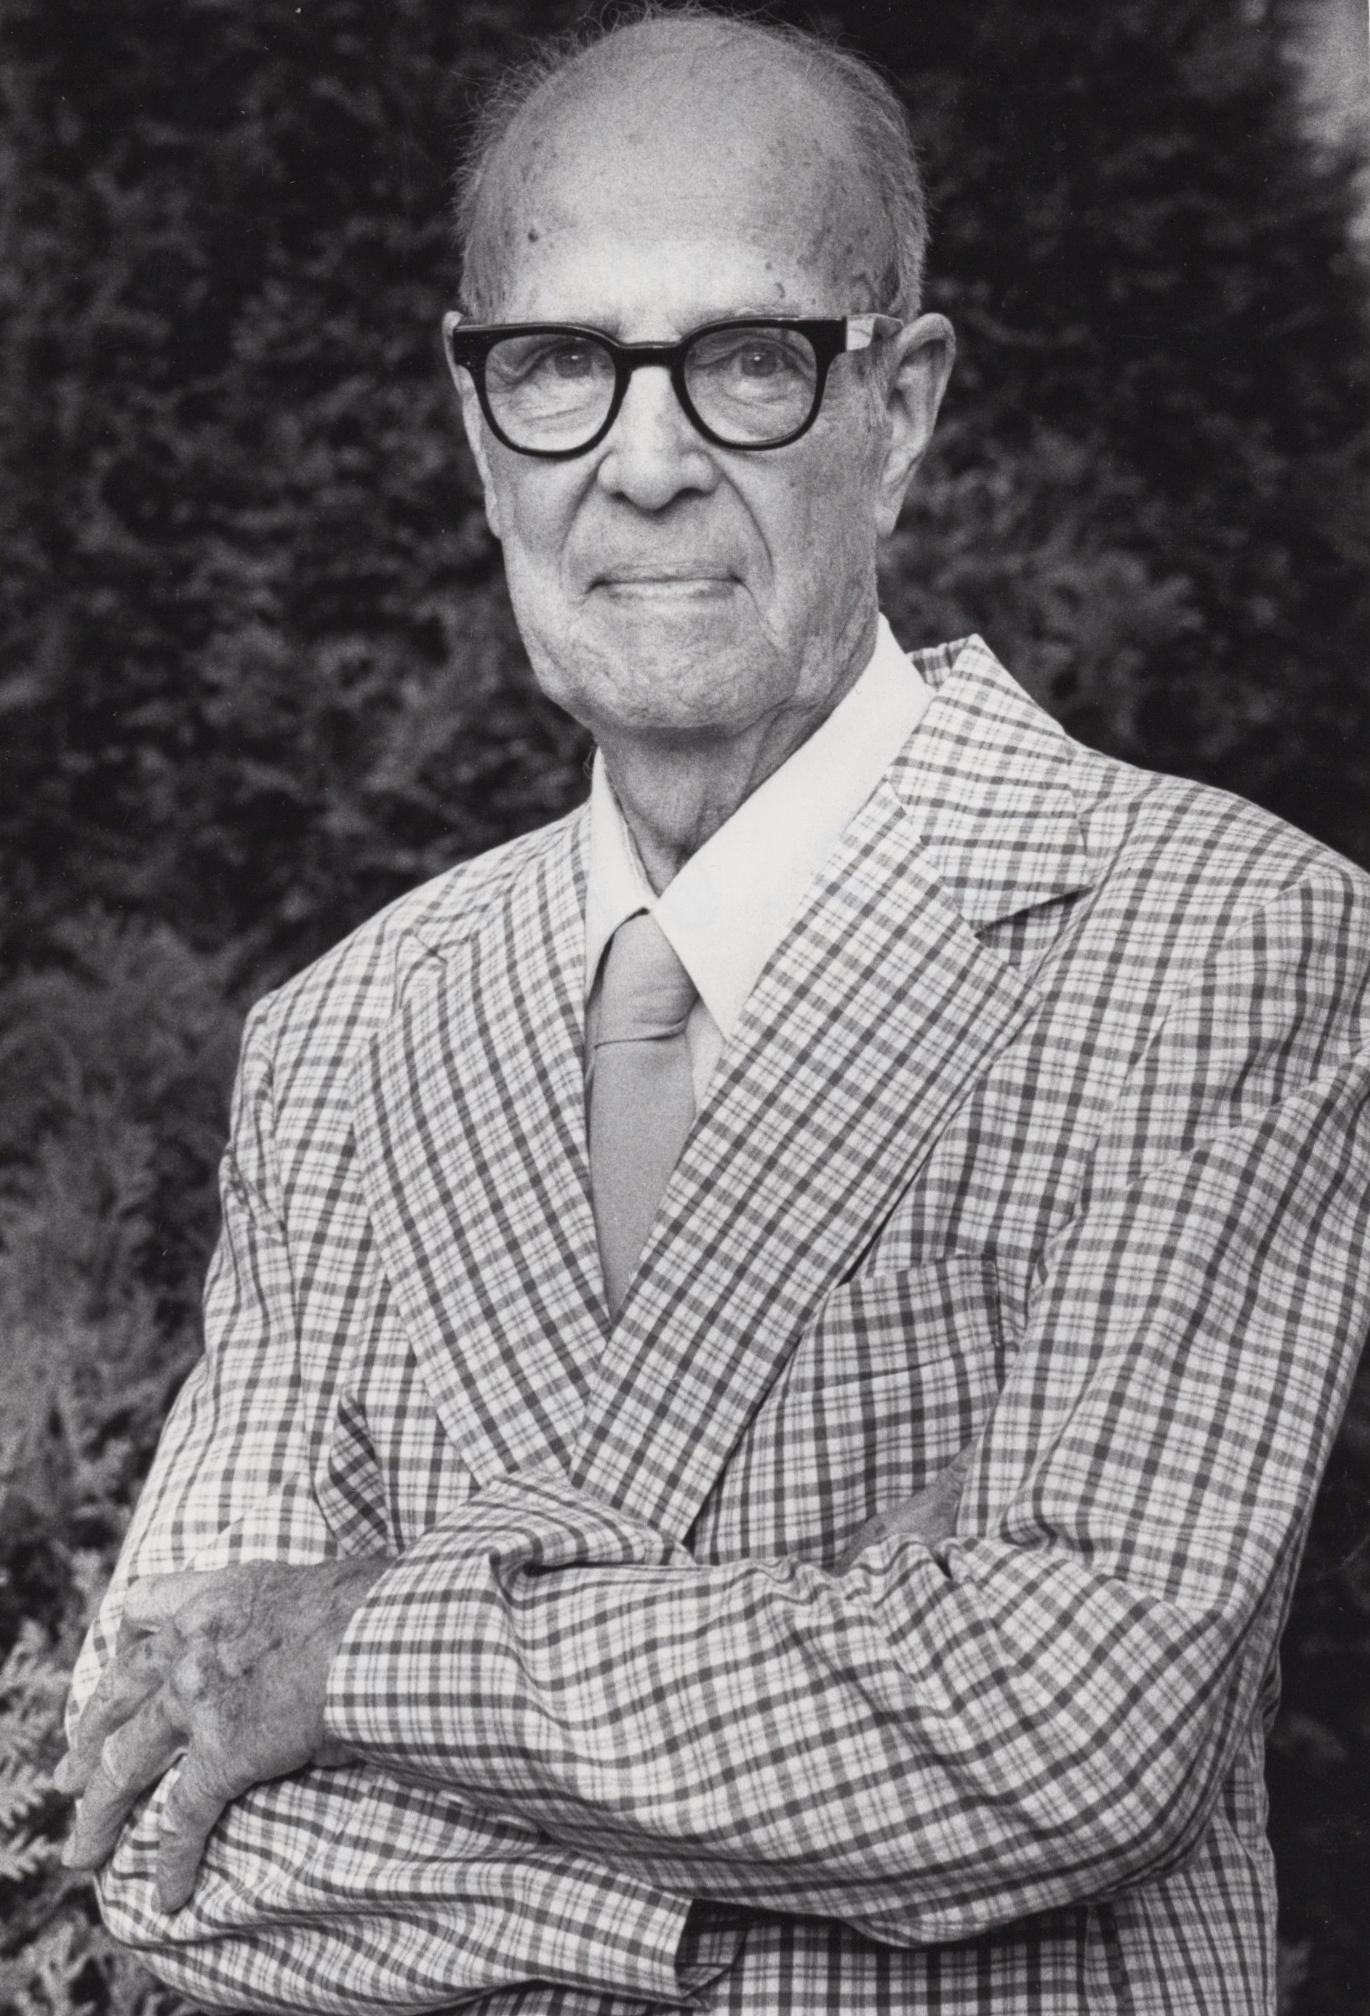 Charles E. Applegate